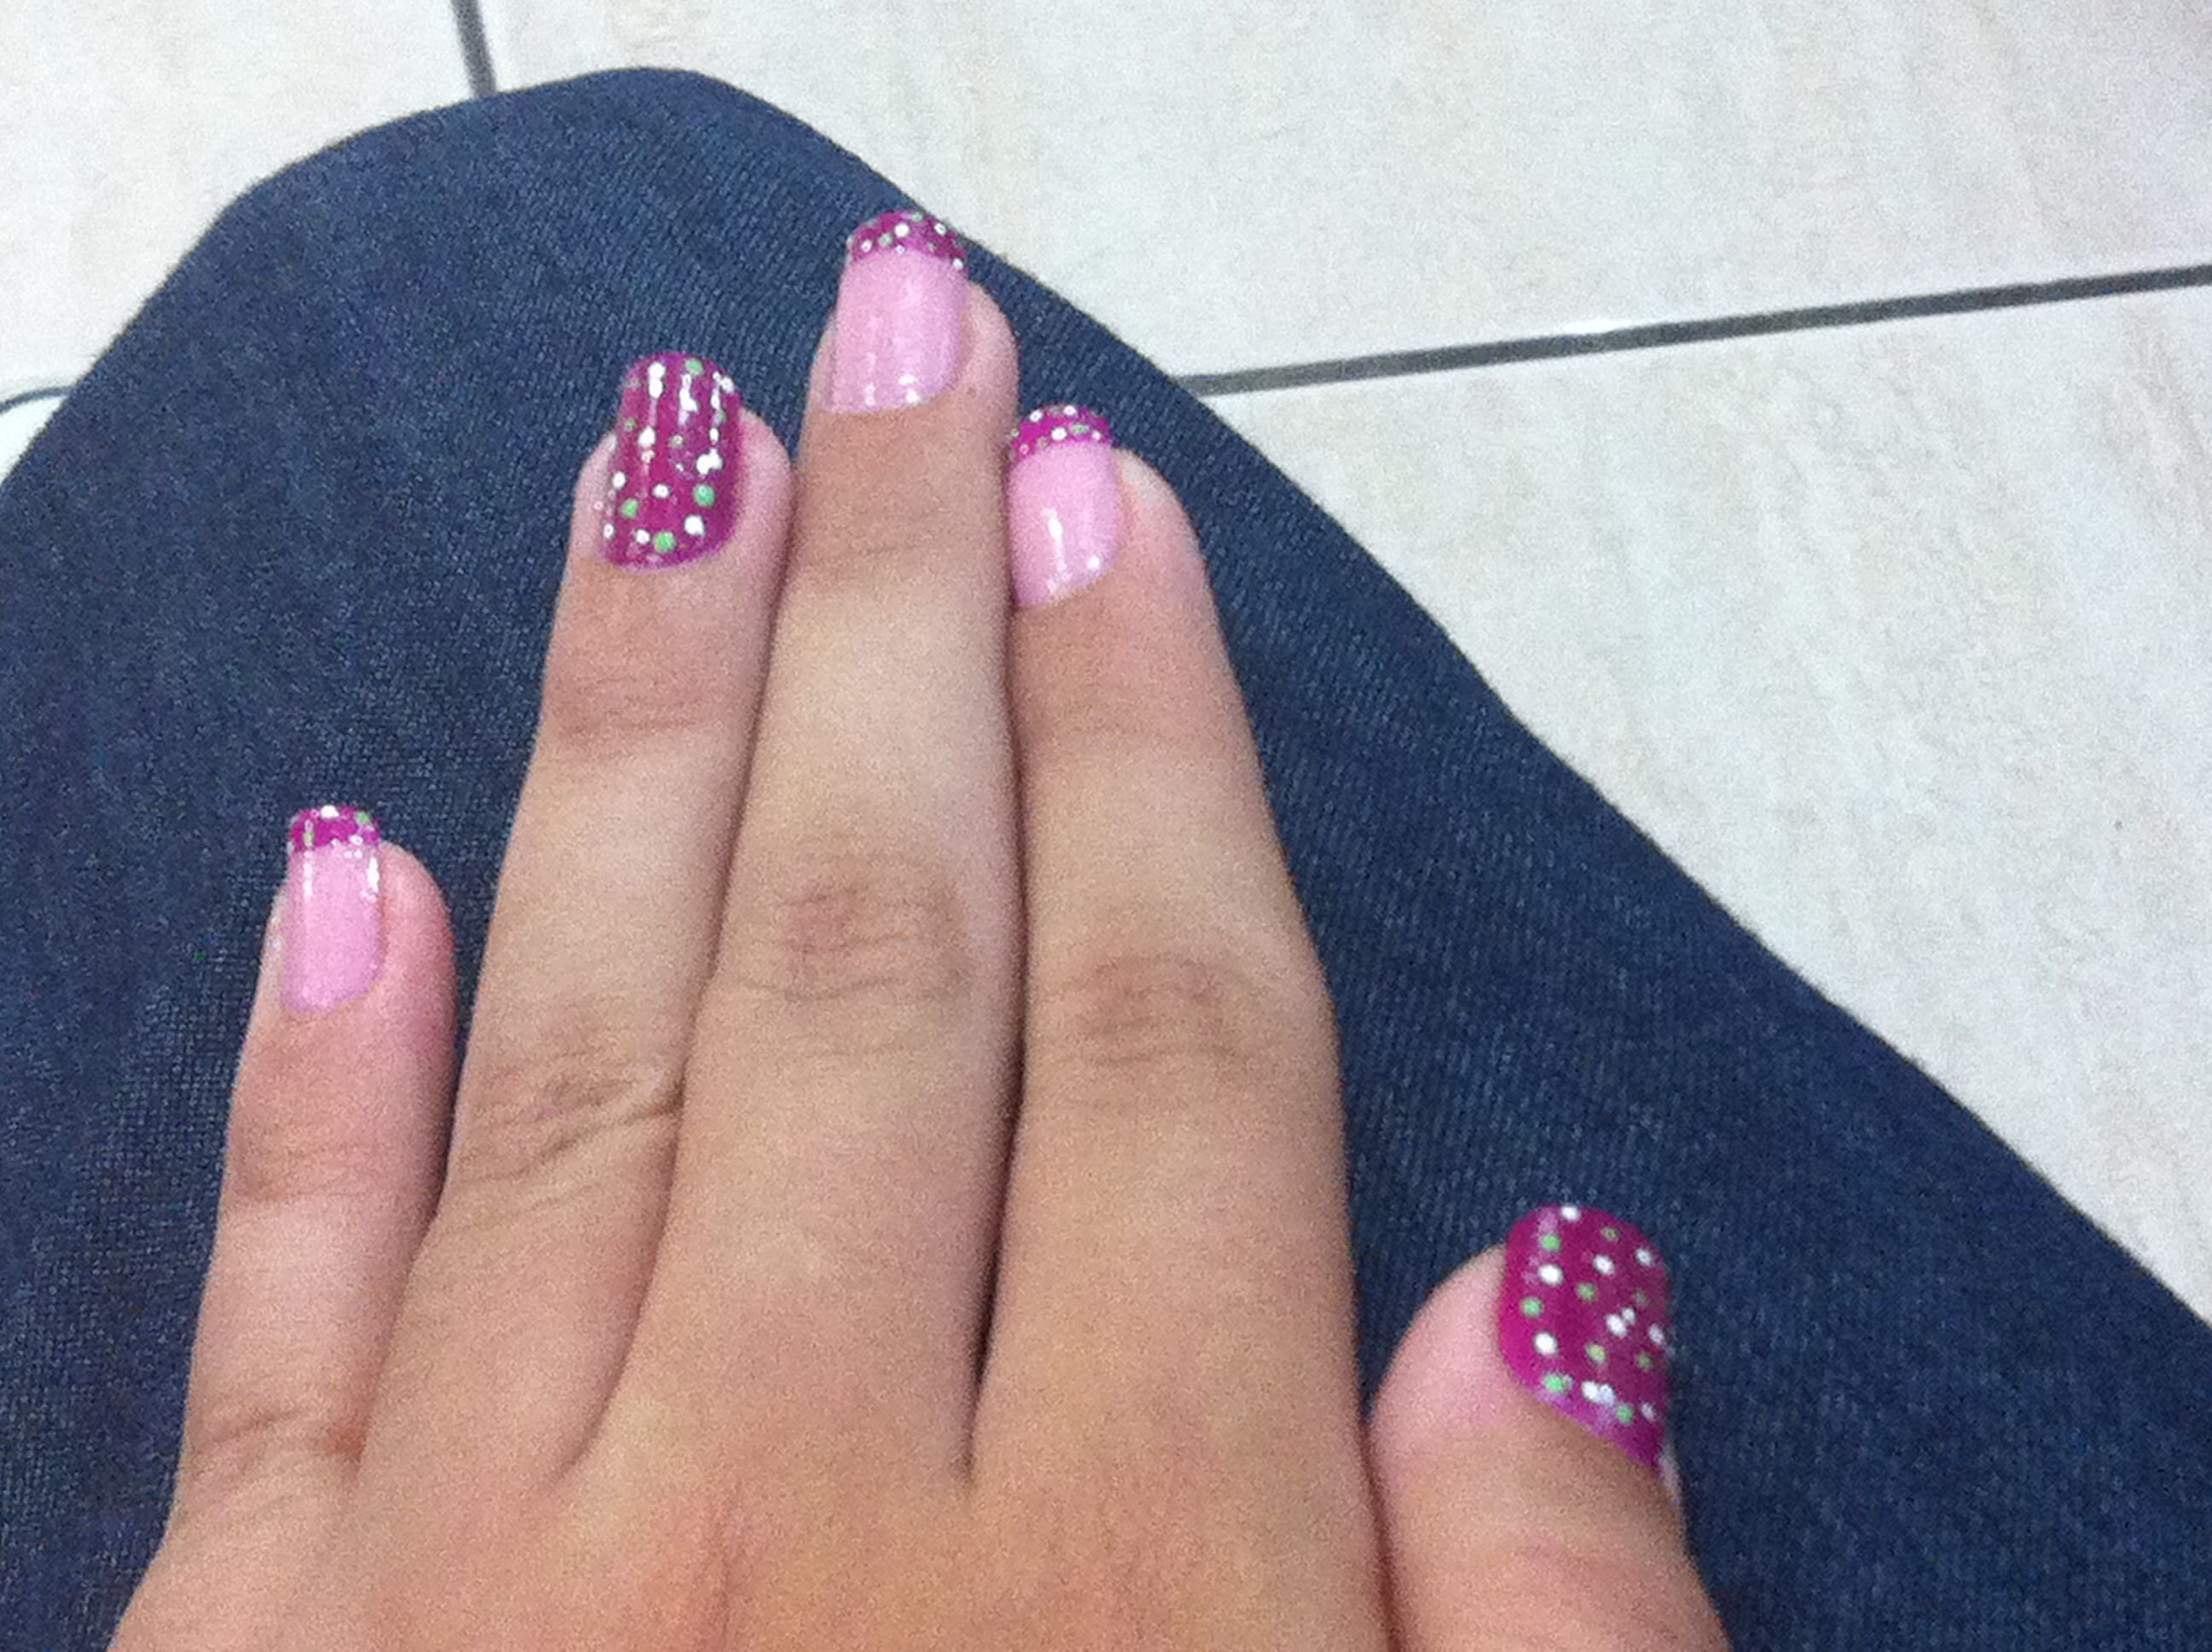 Fio's beautiful nails